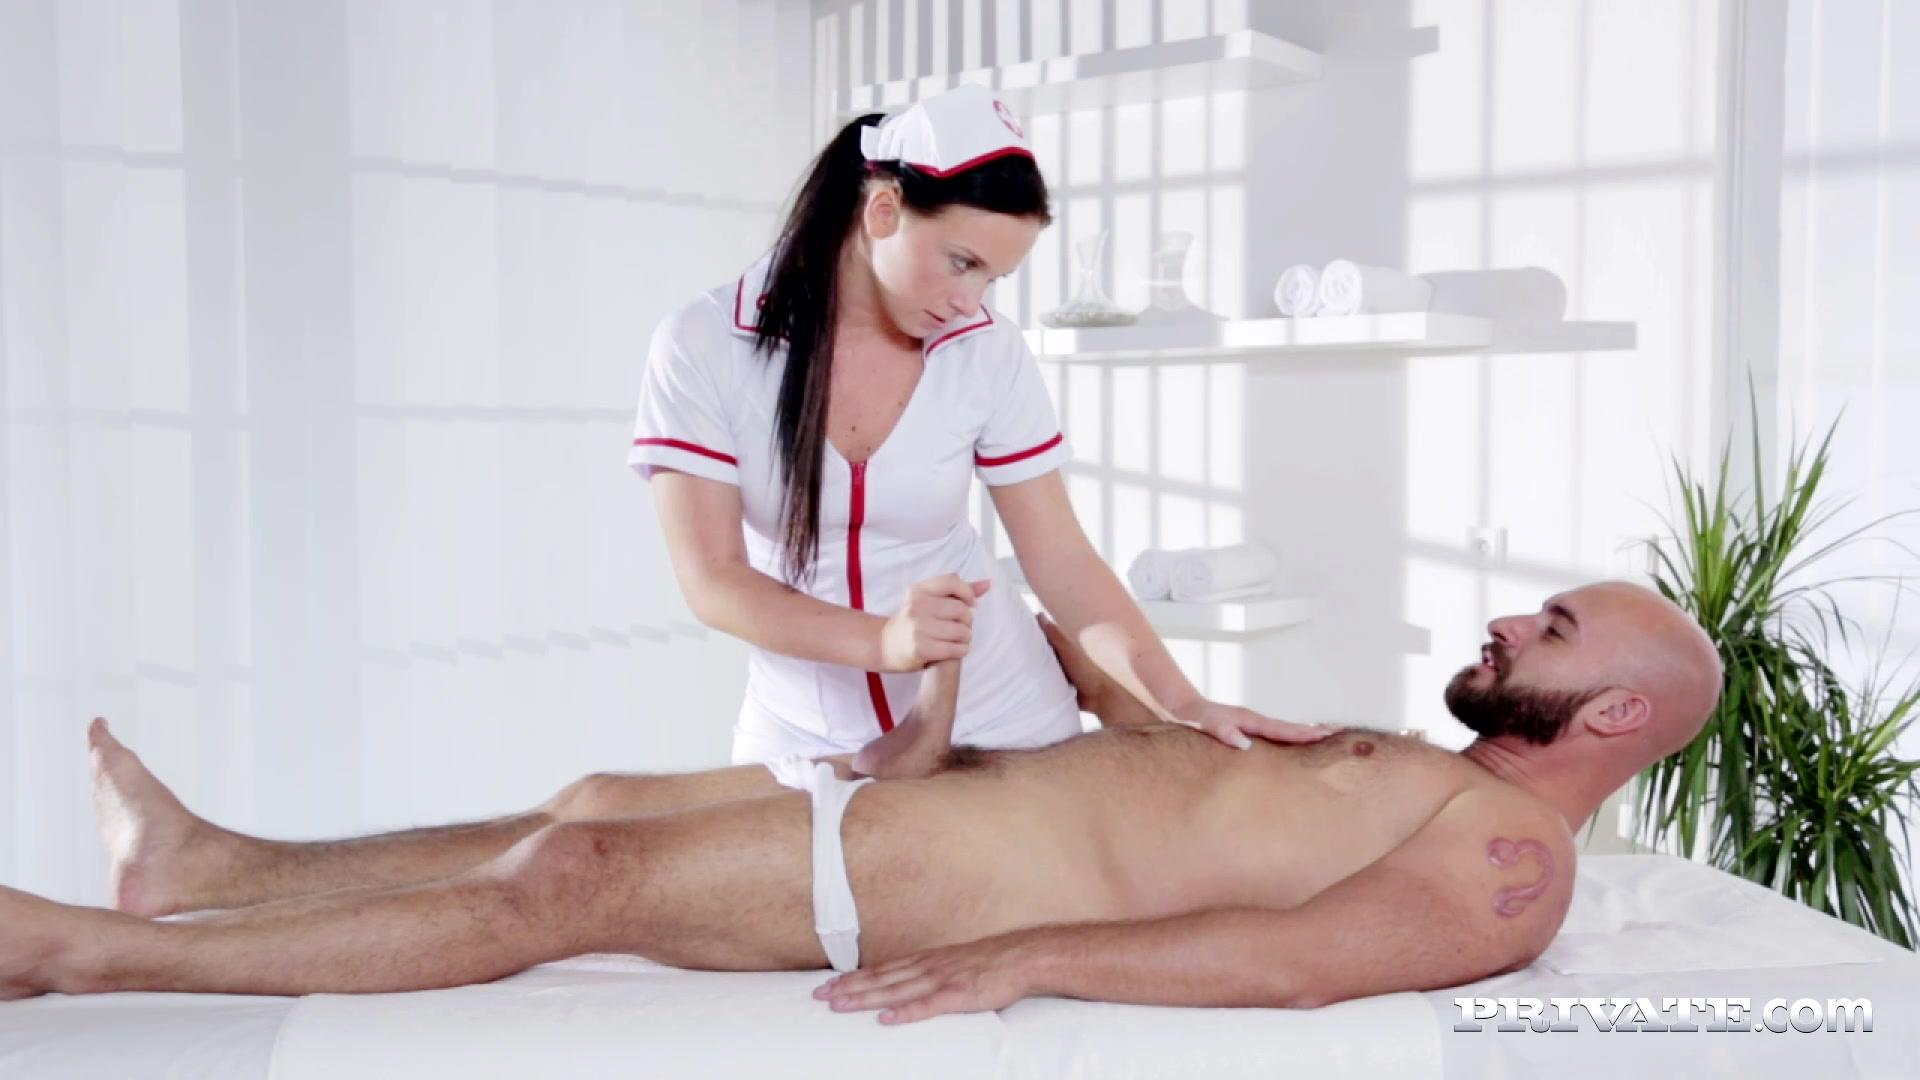 Девушки делают массаж члена парню — img 11